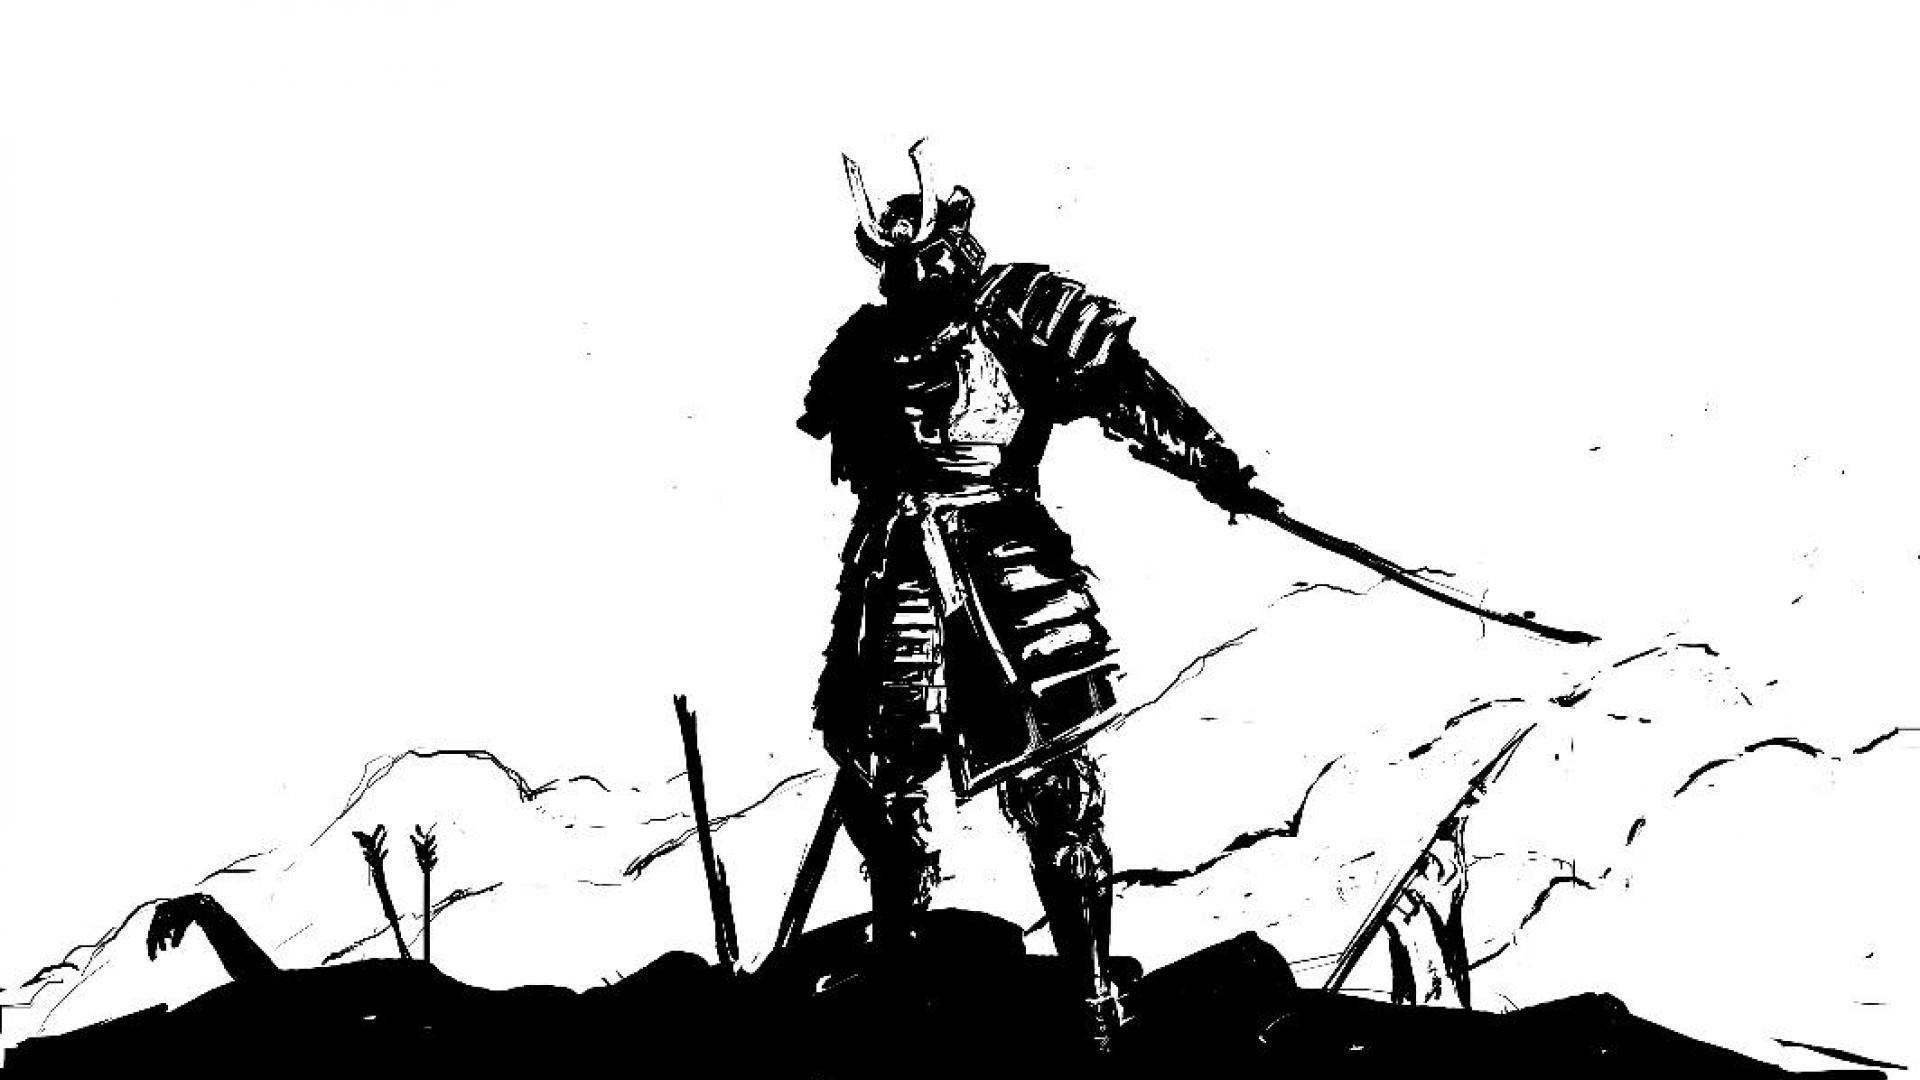 Black And White Samurai Wallpapers Top Free Black And White Samurai Backgrounds Wallpaperaccess